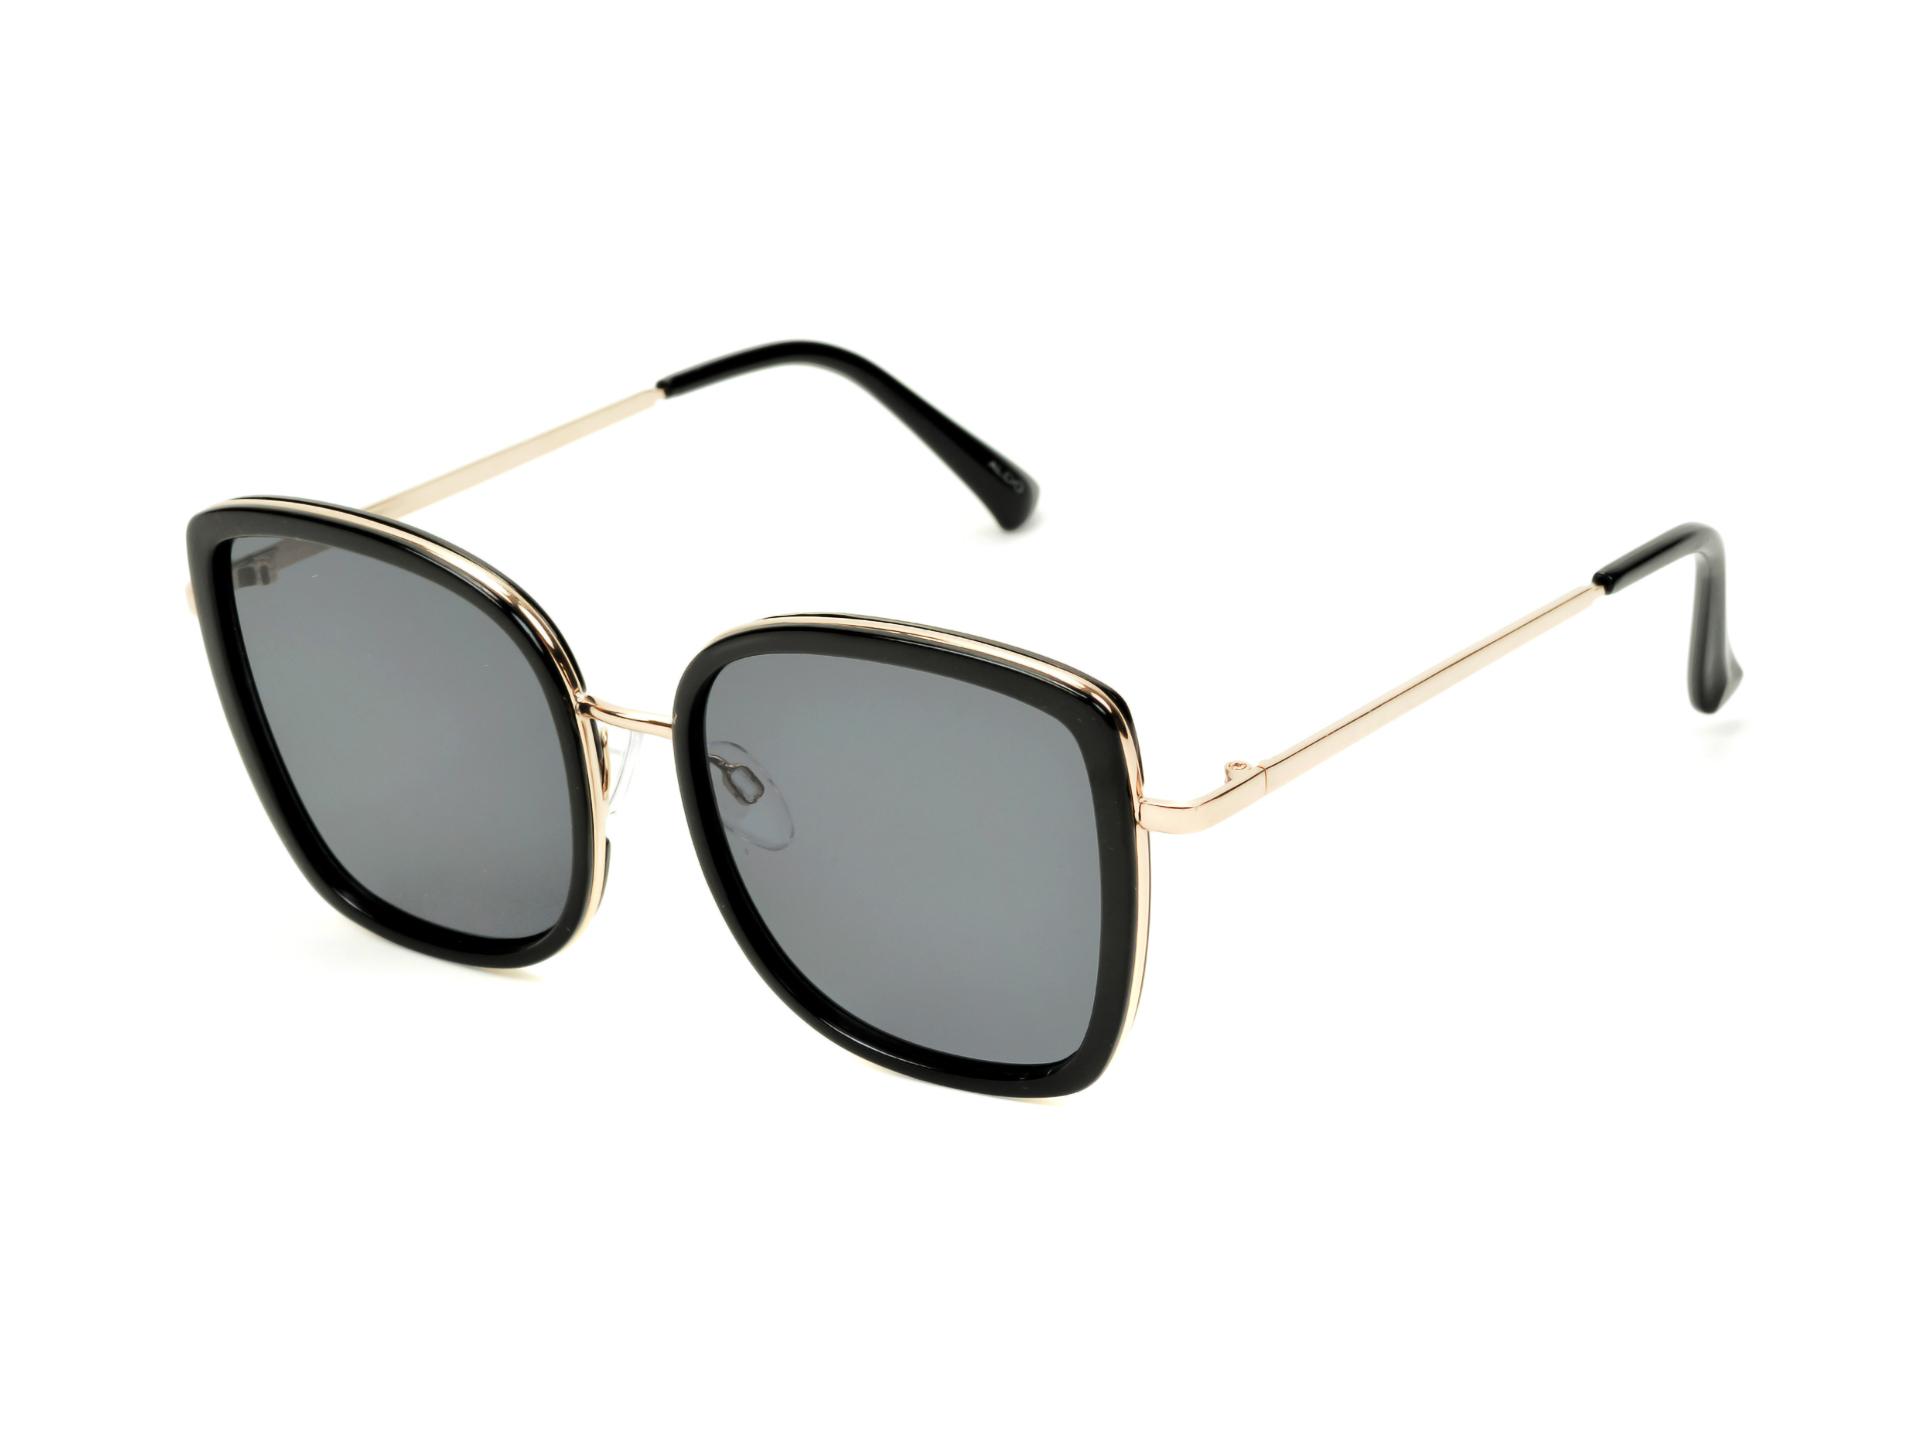 Ochelari de soare ALDO negri, Aaonia970, din PVC imagine